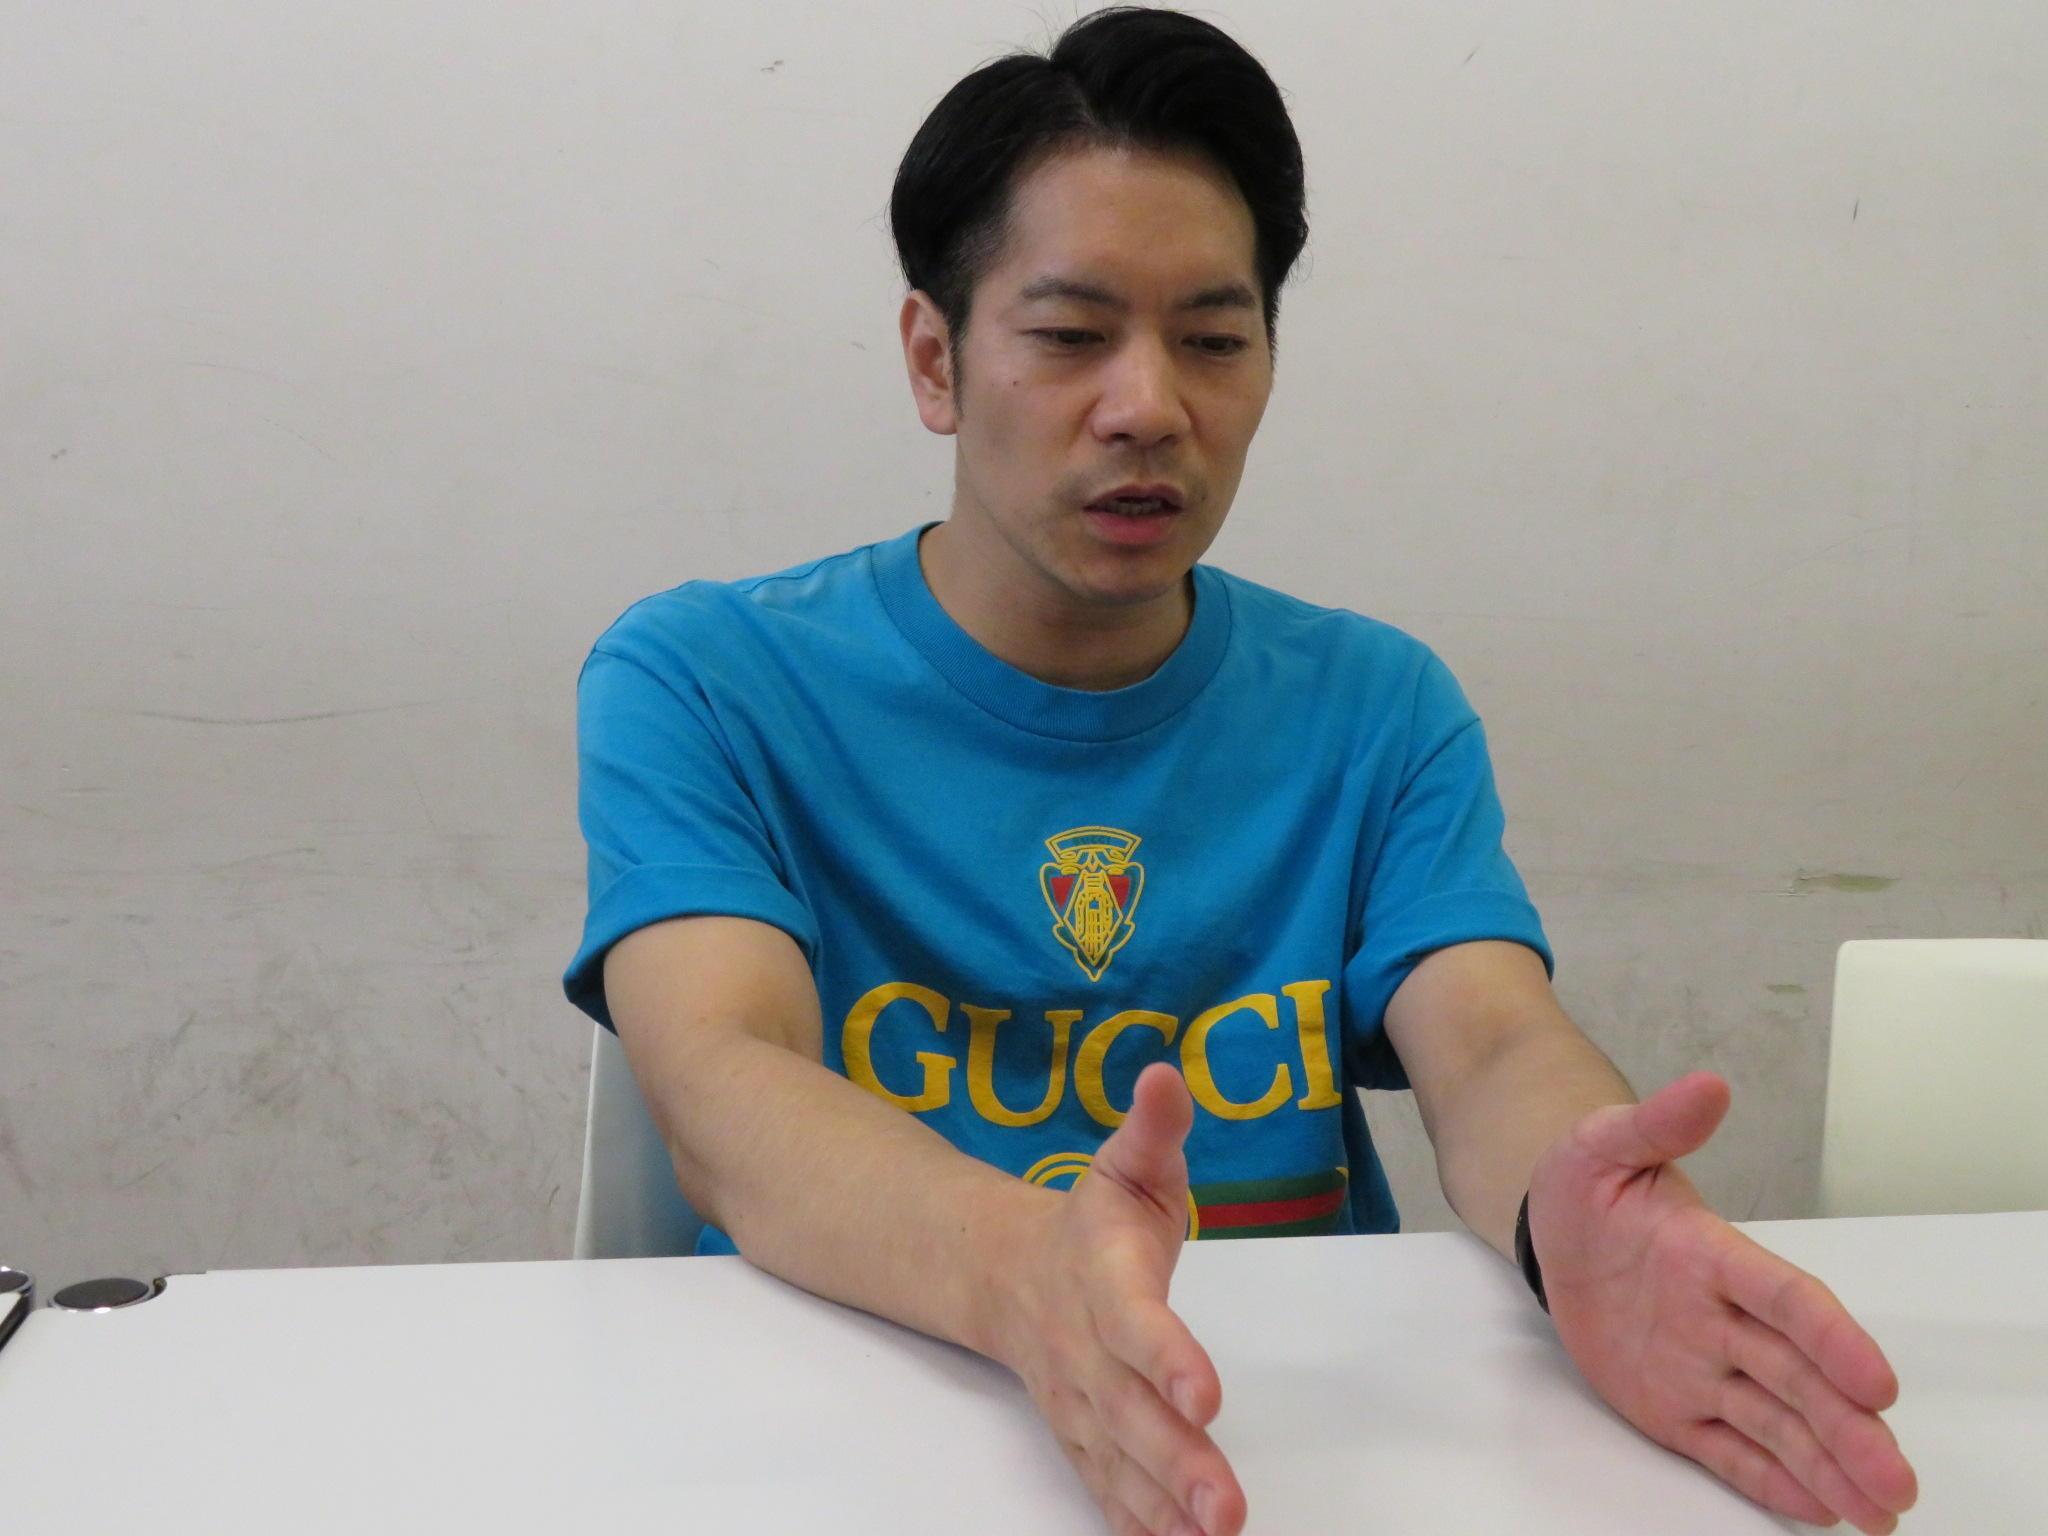 http://news.yoshimoto.co.jp/20180801110329-802fefba692a679d365aafe63ff901c5a3f54c30.jpg